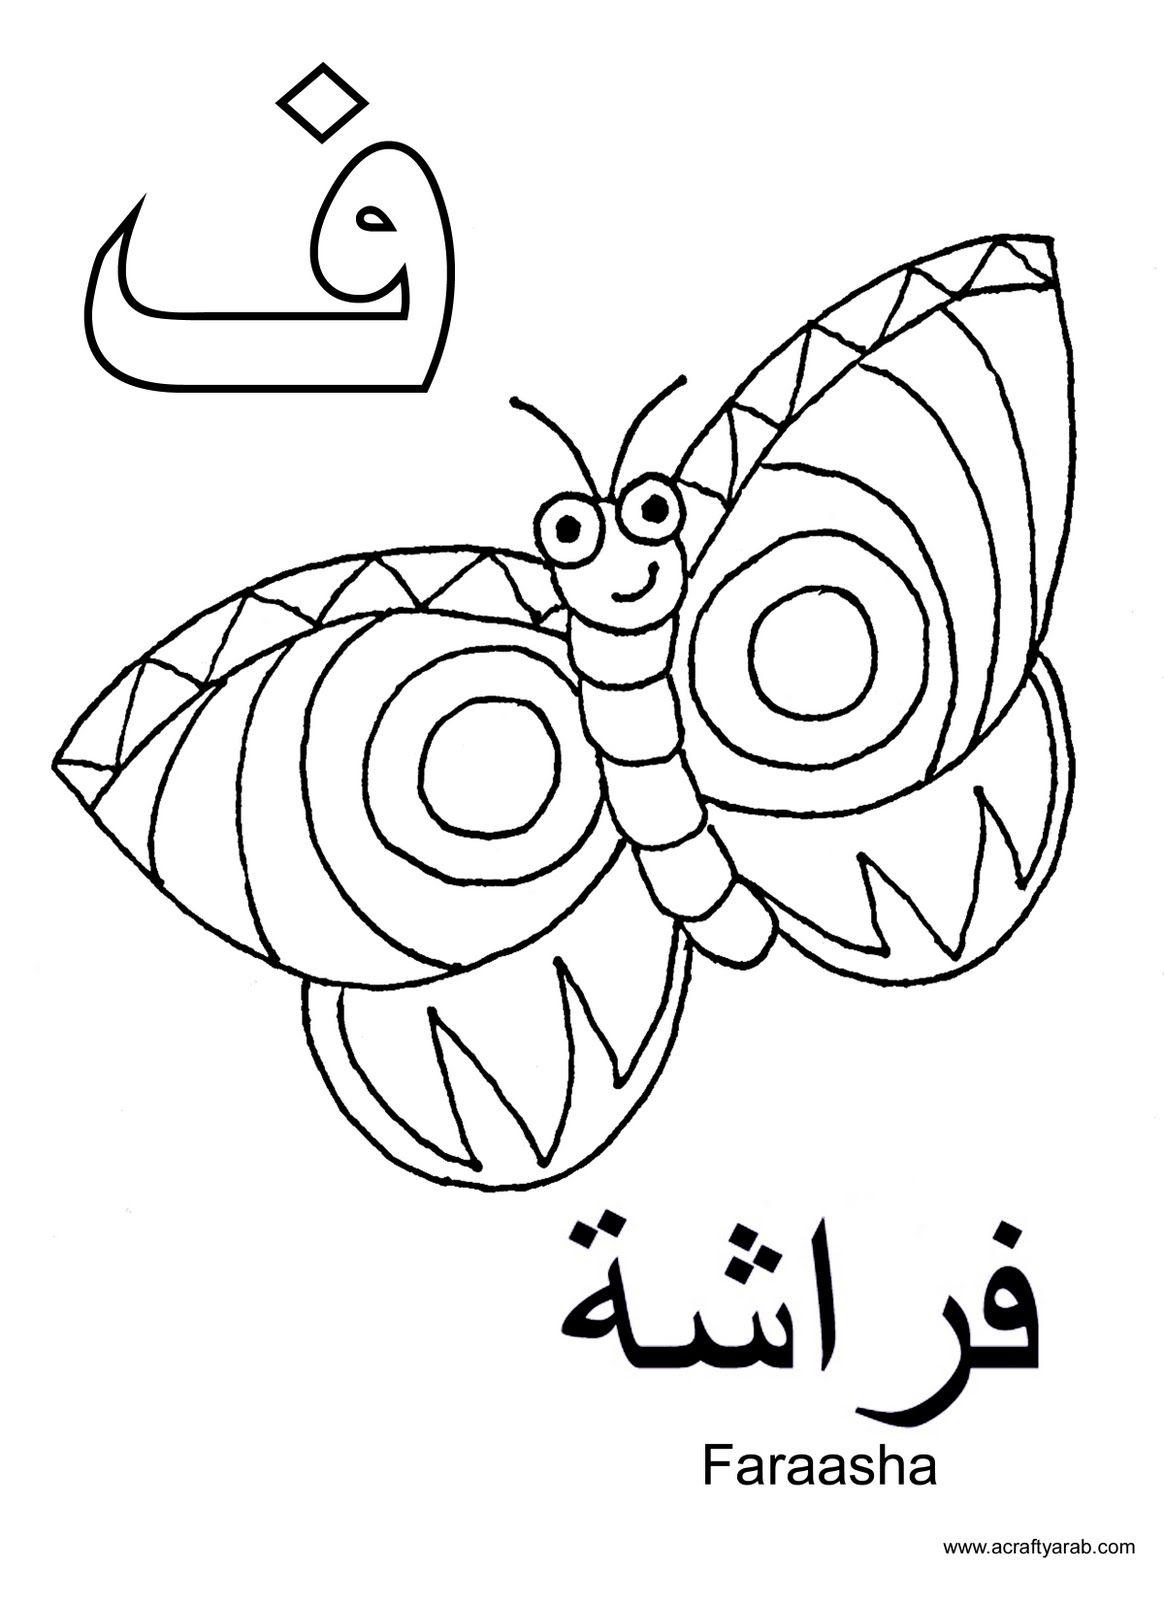 A Crafty Arab Arabic Alphabet Coloring Pages Fa Is For Faraasha